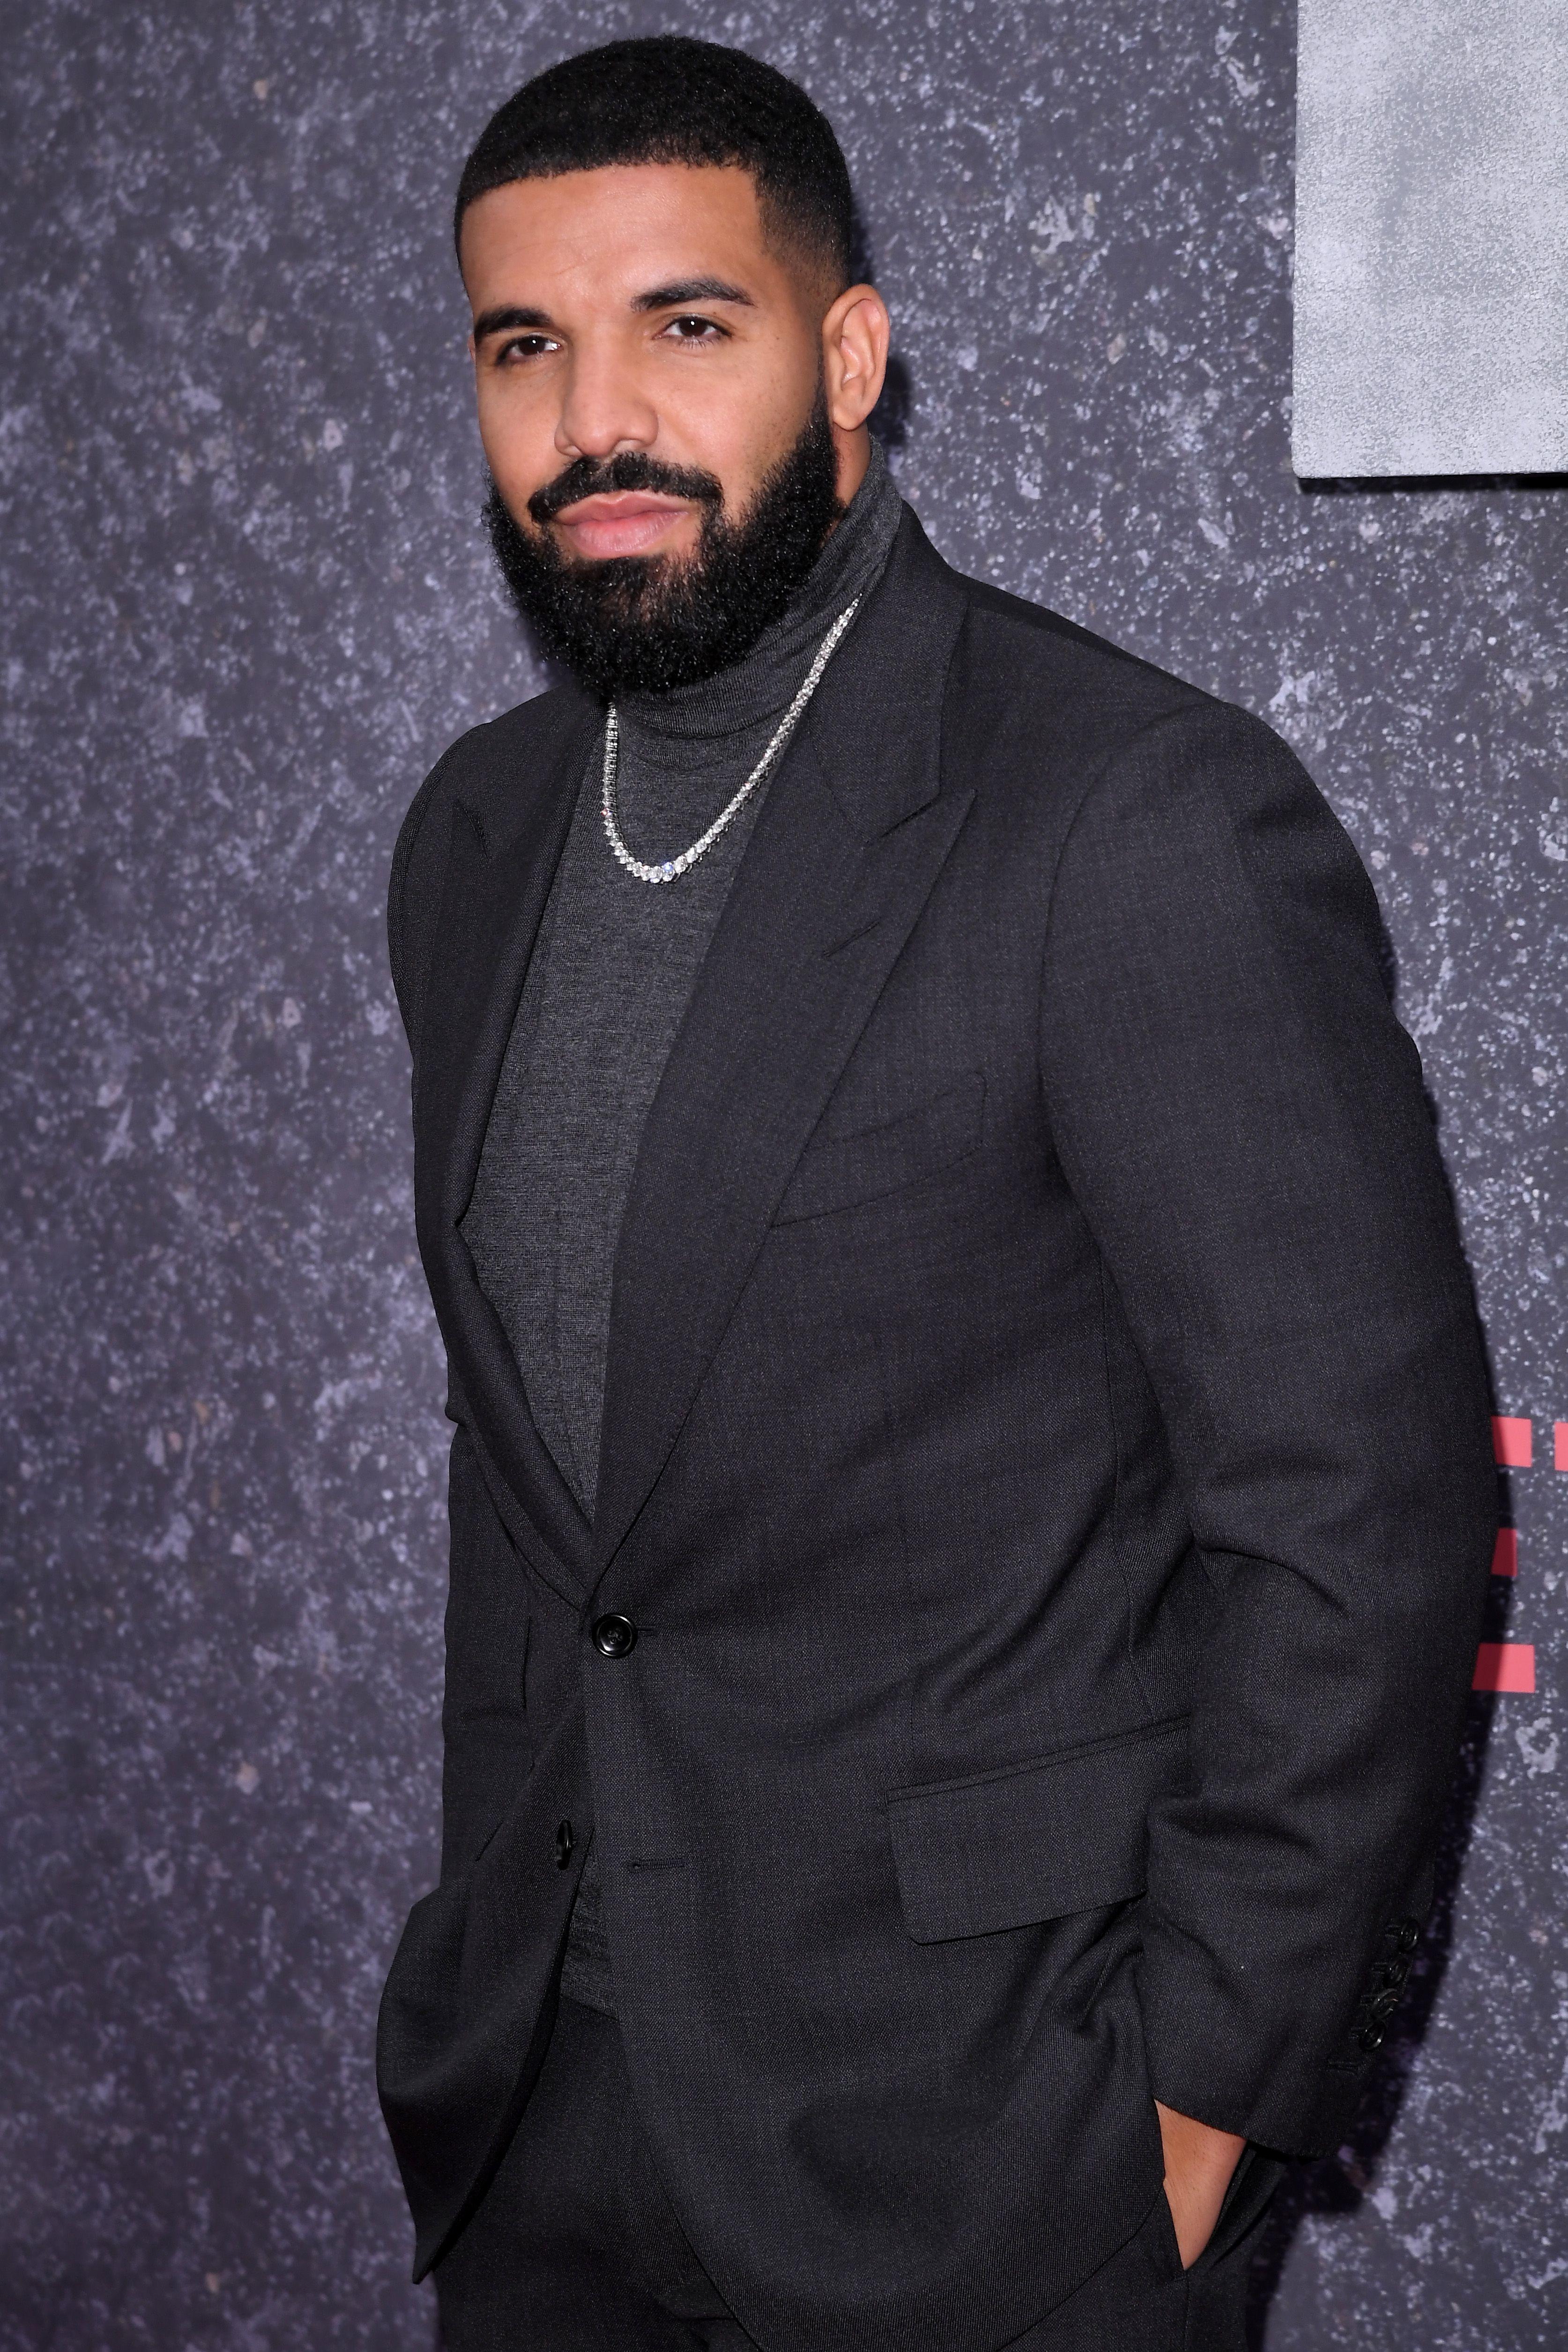 Like Im Supposed To Drake : supposed, drake, Drake, Unveils, 50,000-square-foot, House,, Stars, Nothing, Gallery, Wonderwall.com